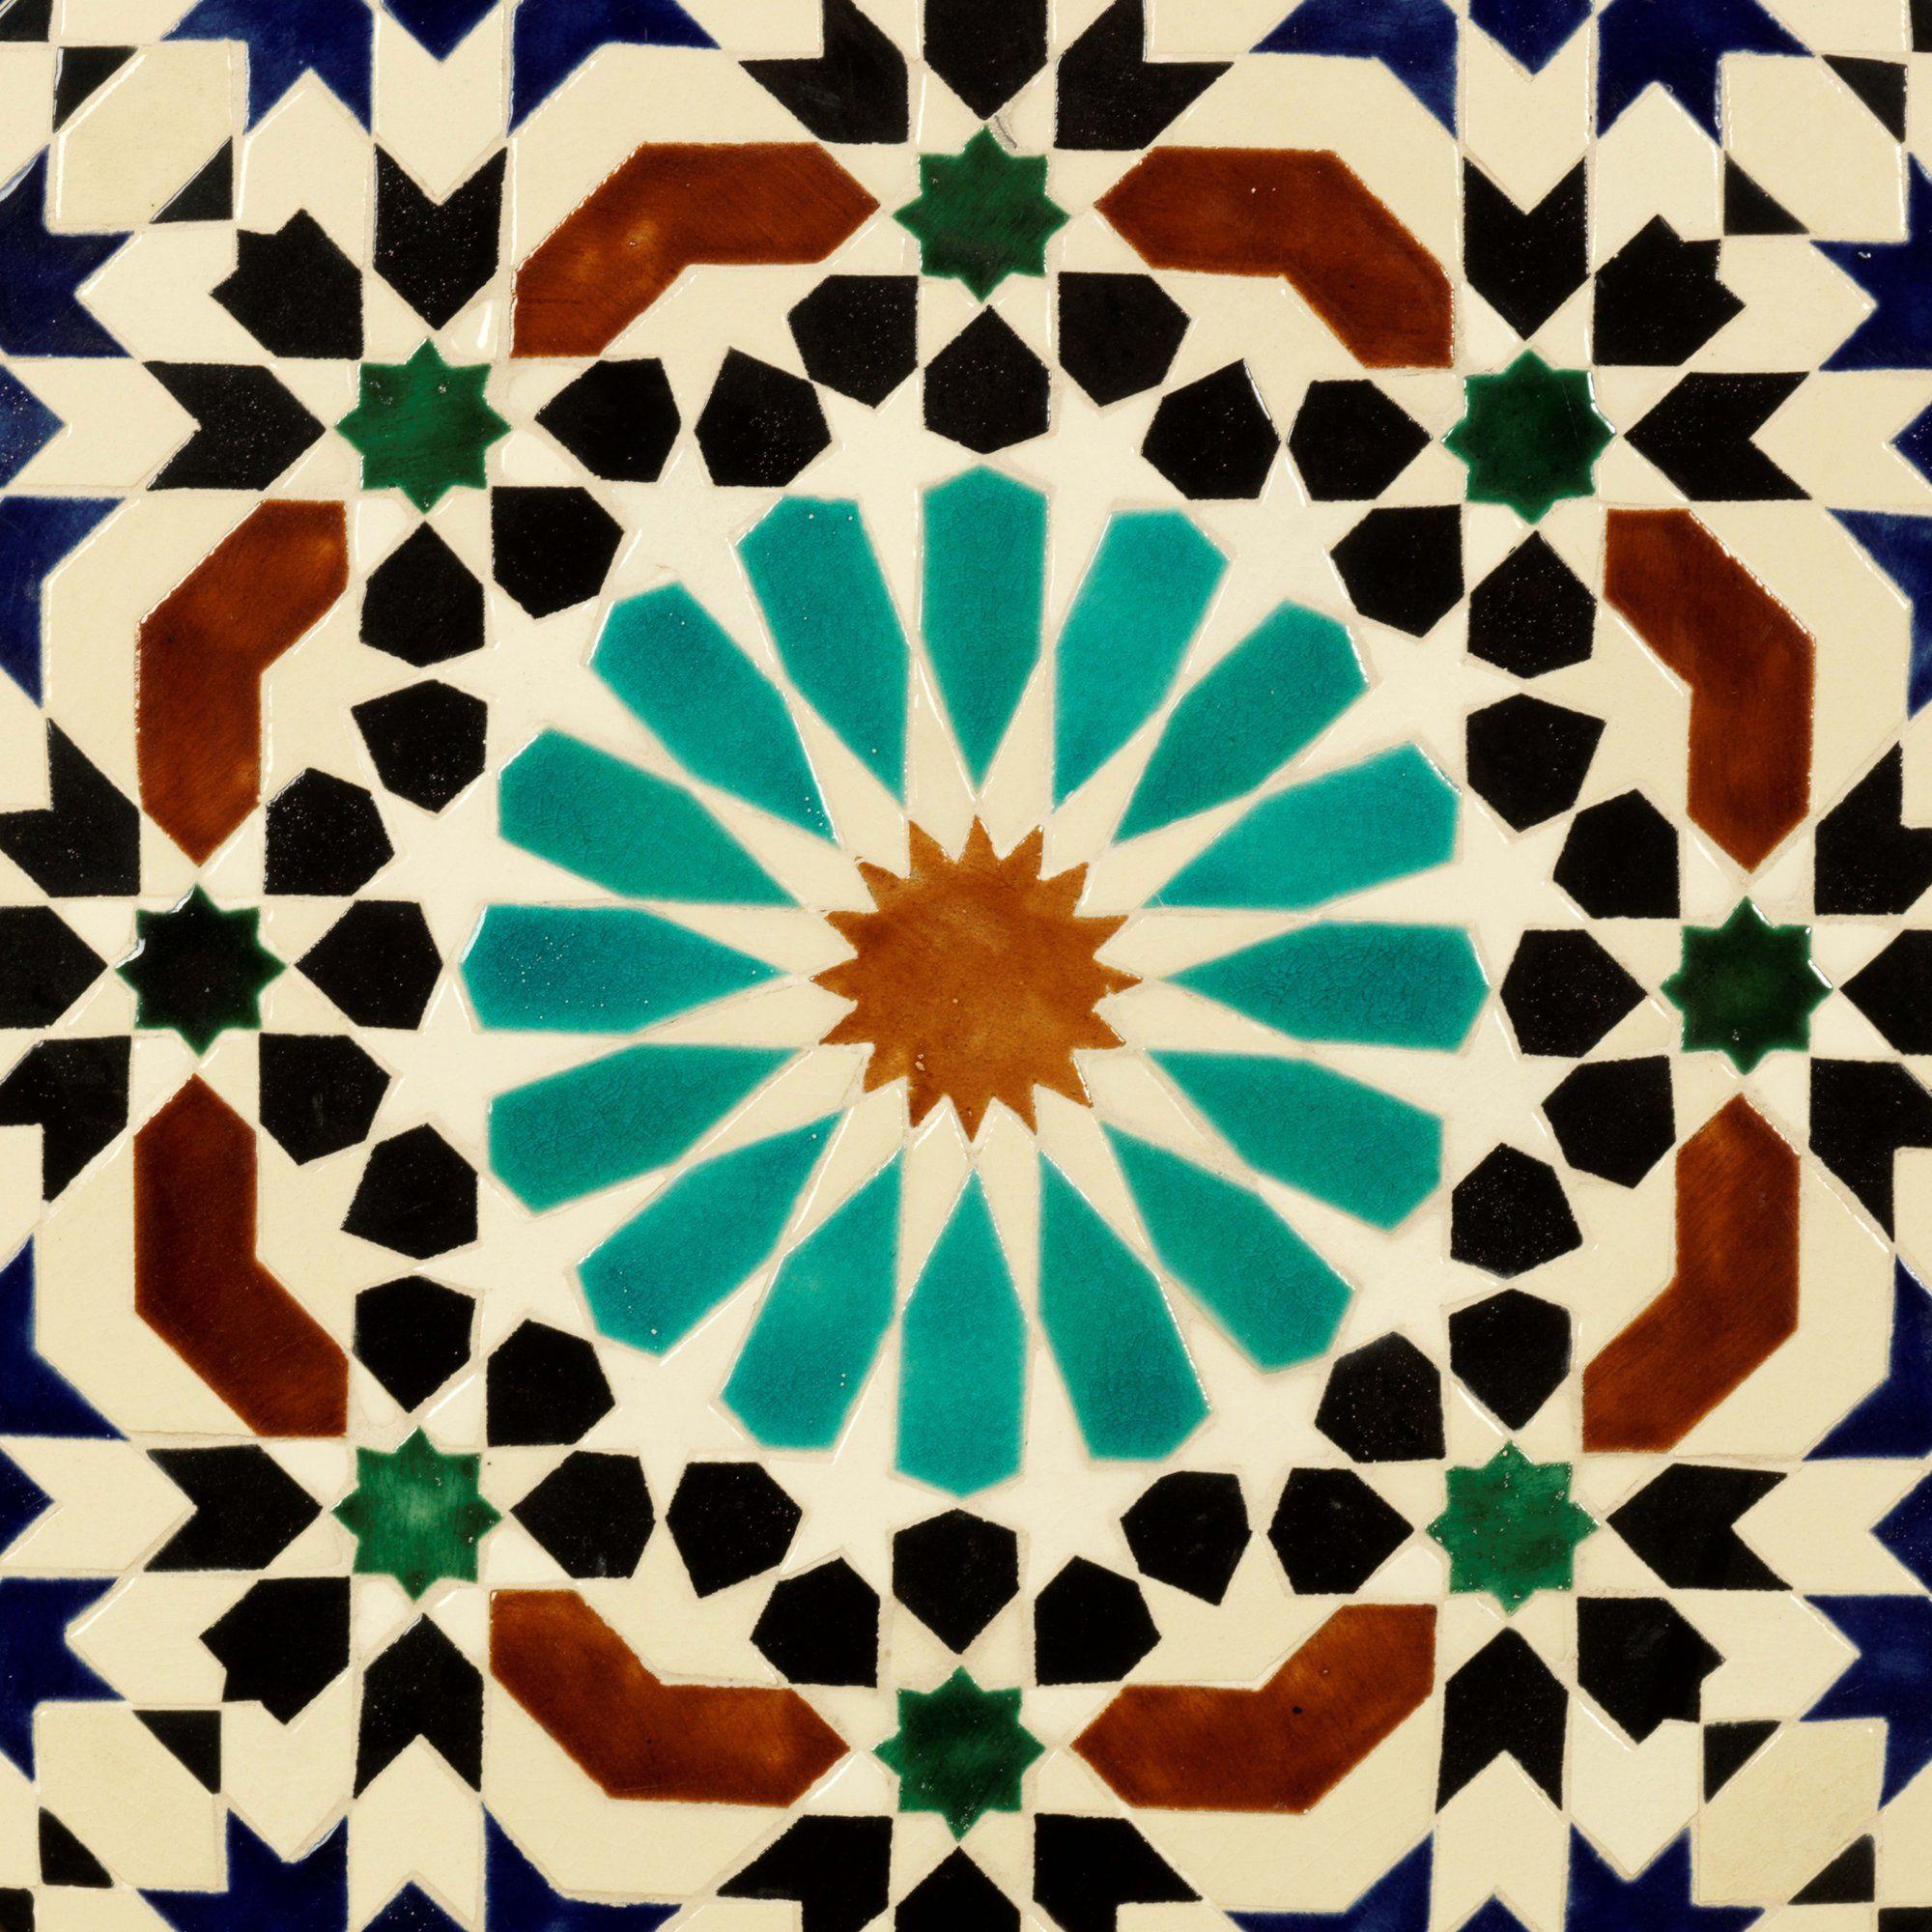 Ceramic tiles art google search ceramics pinterest ceramic ceramic tiles art google search dailygadgetfo Gallery